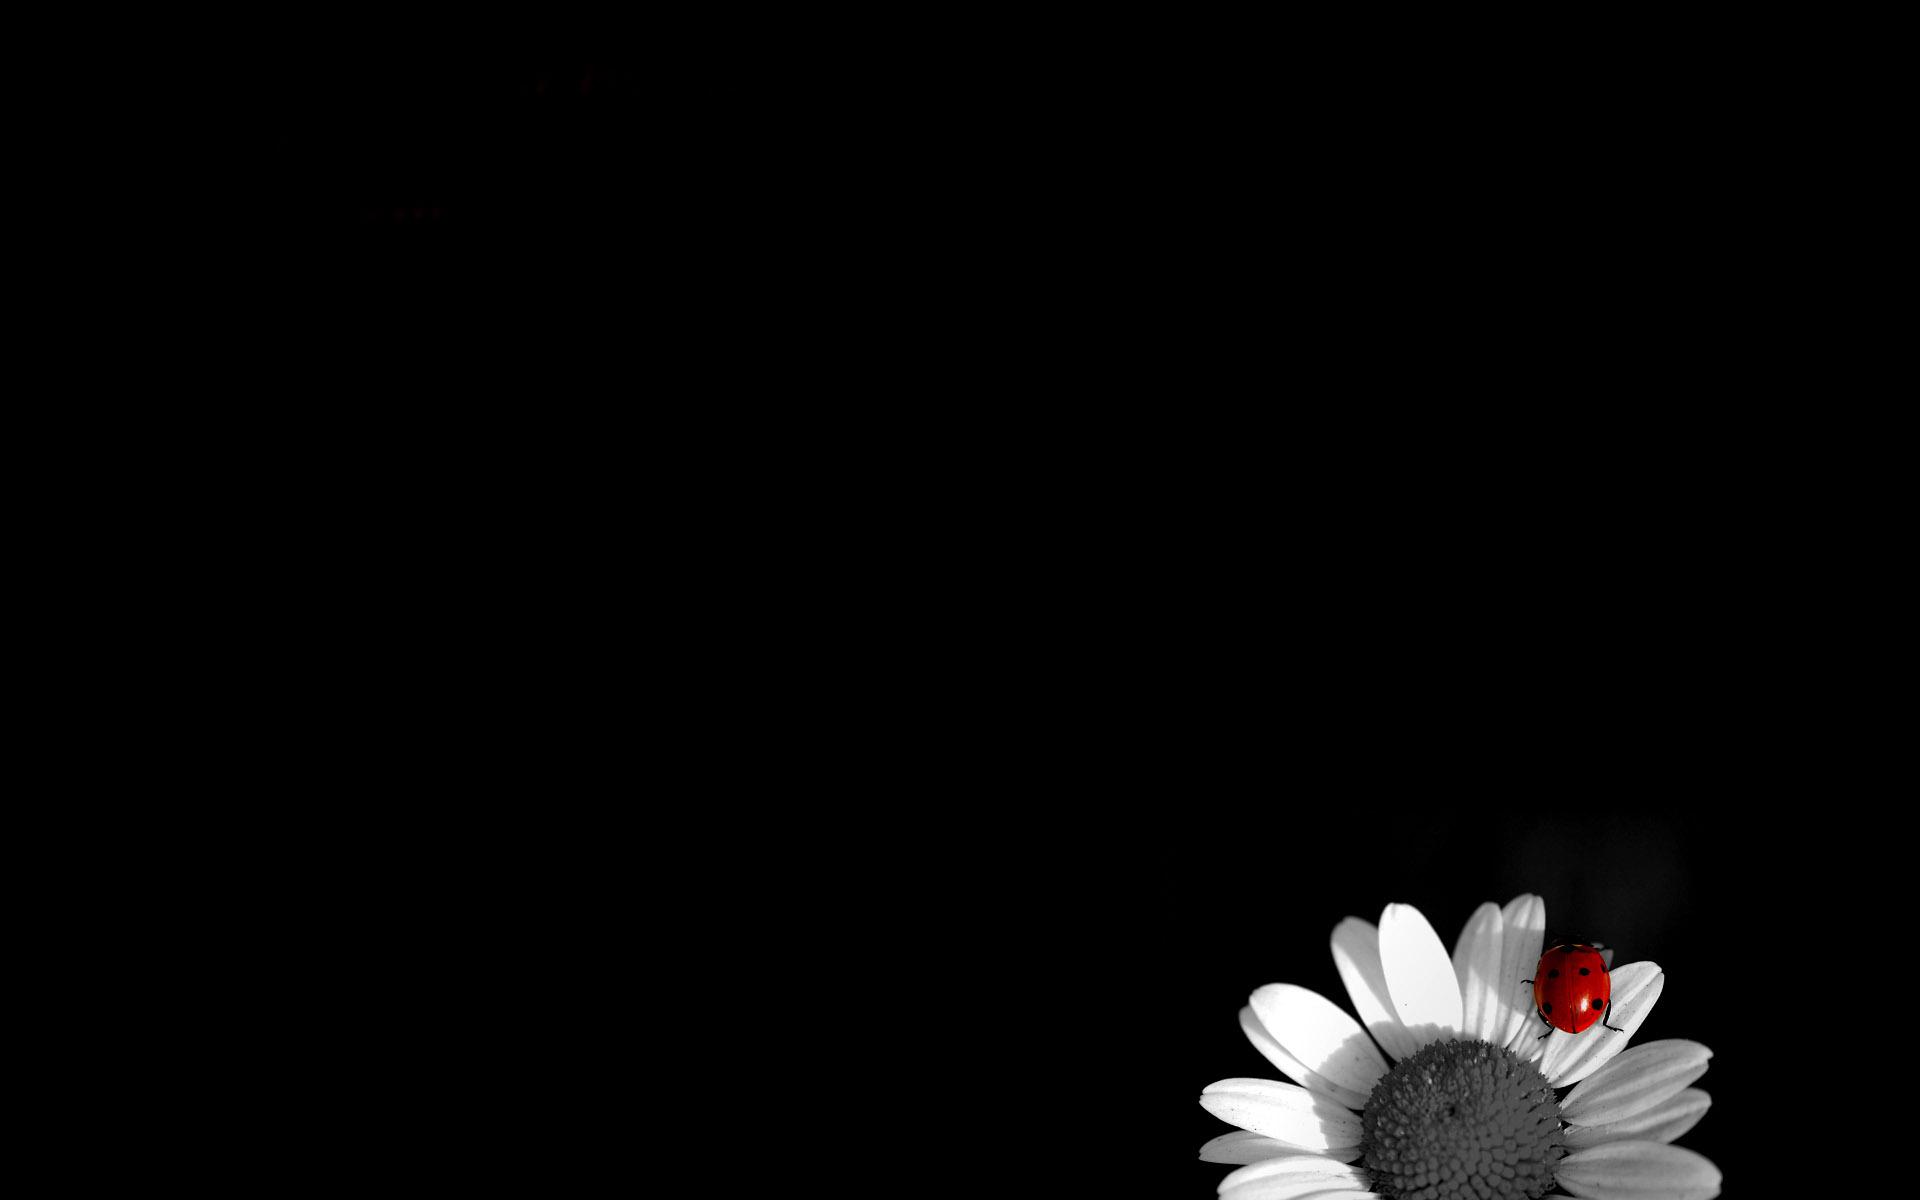 Free Download 40 Dark Wallpaper Images In 4k For Desktop Laptop